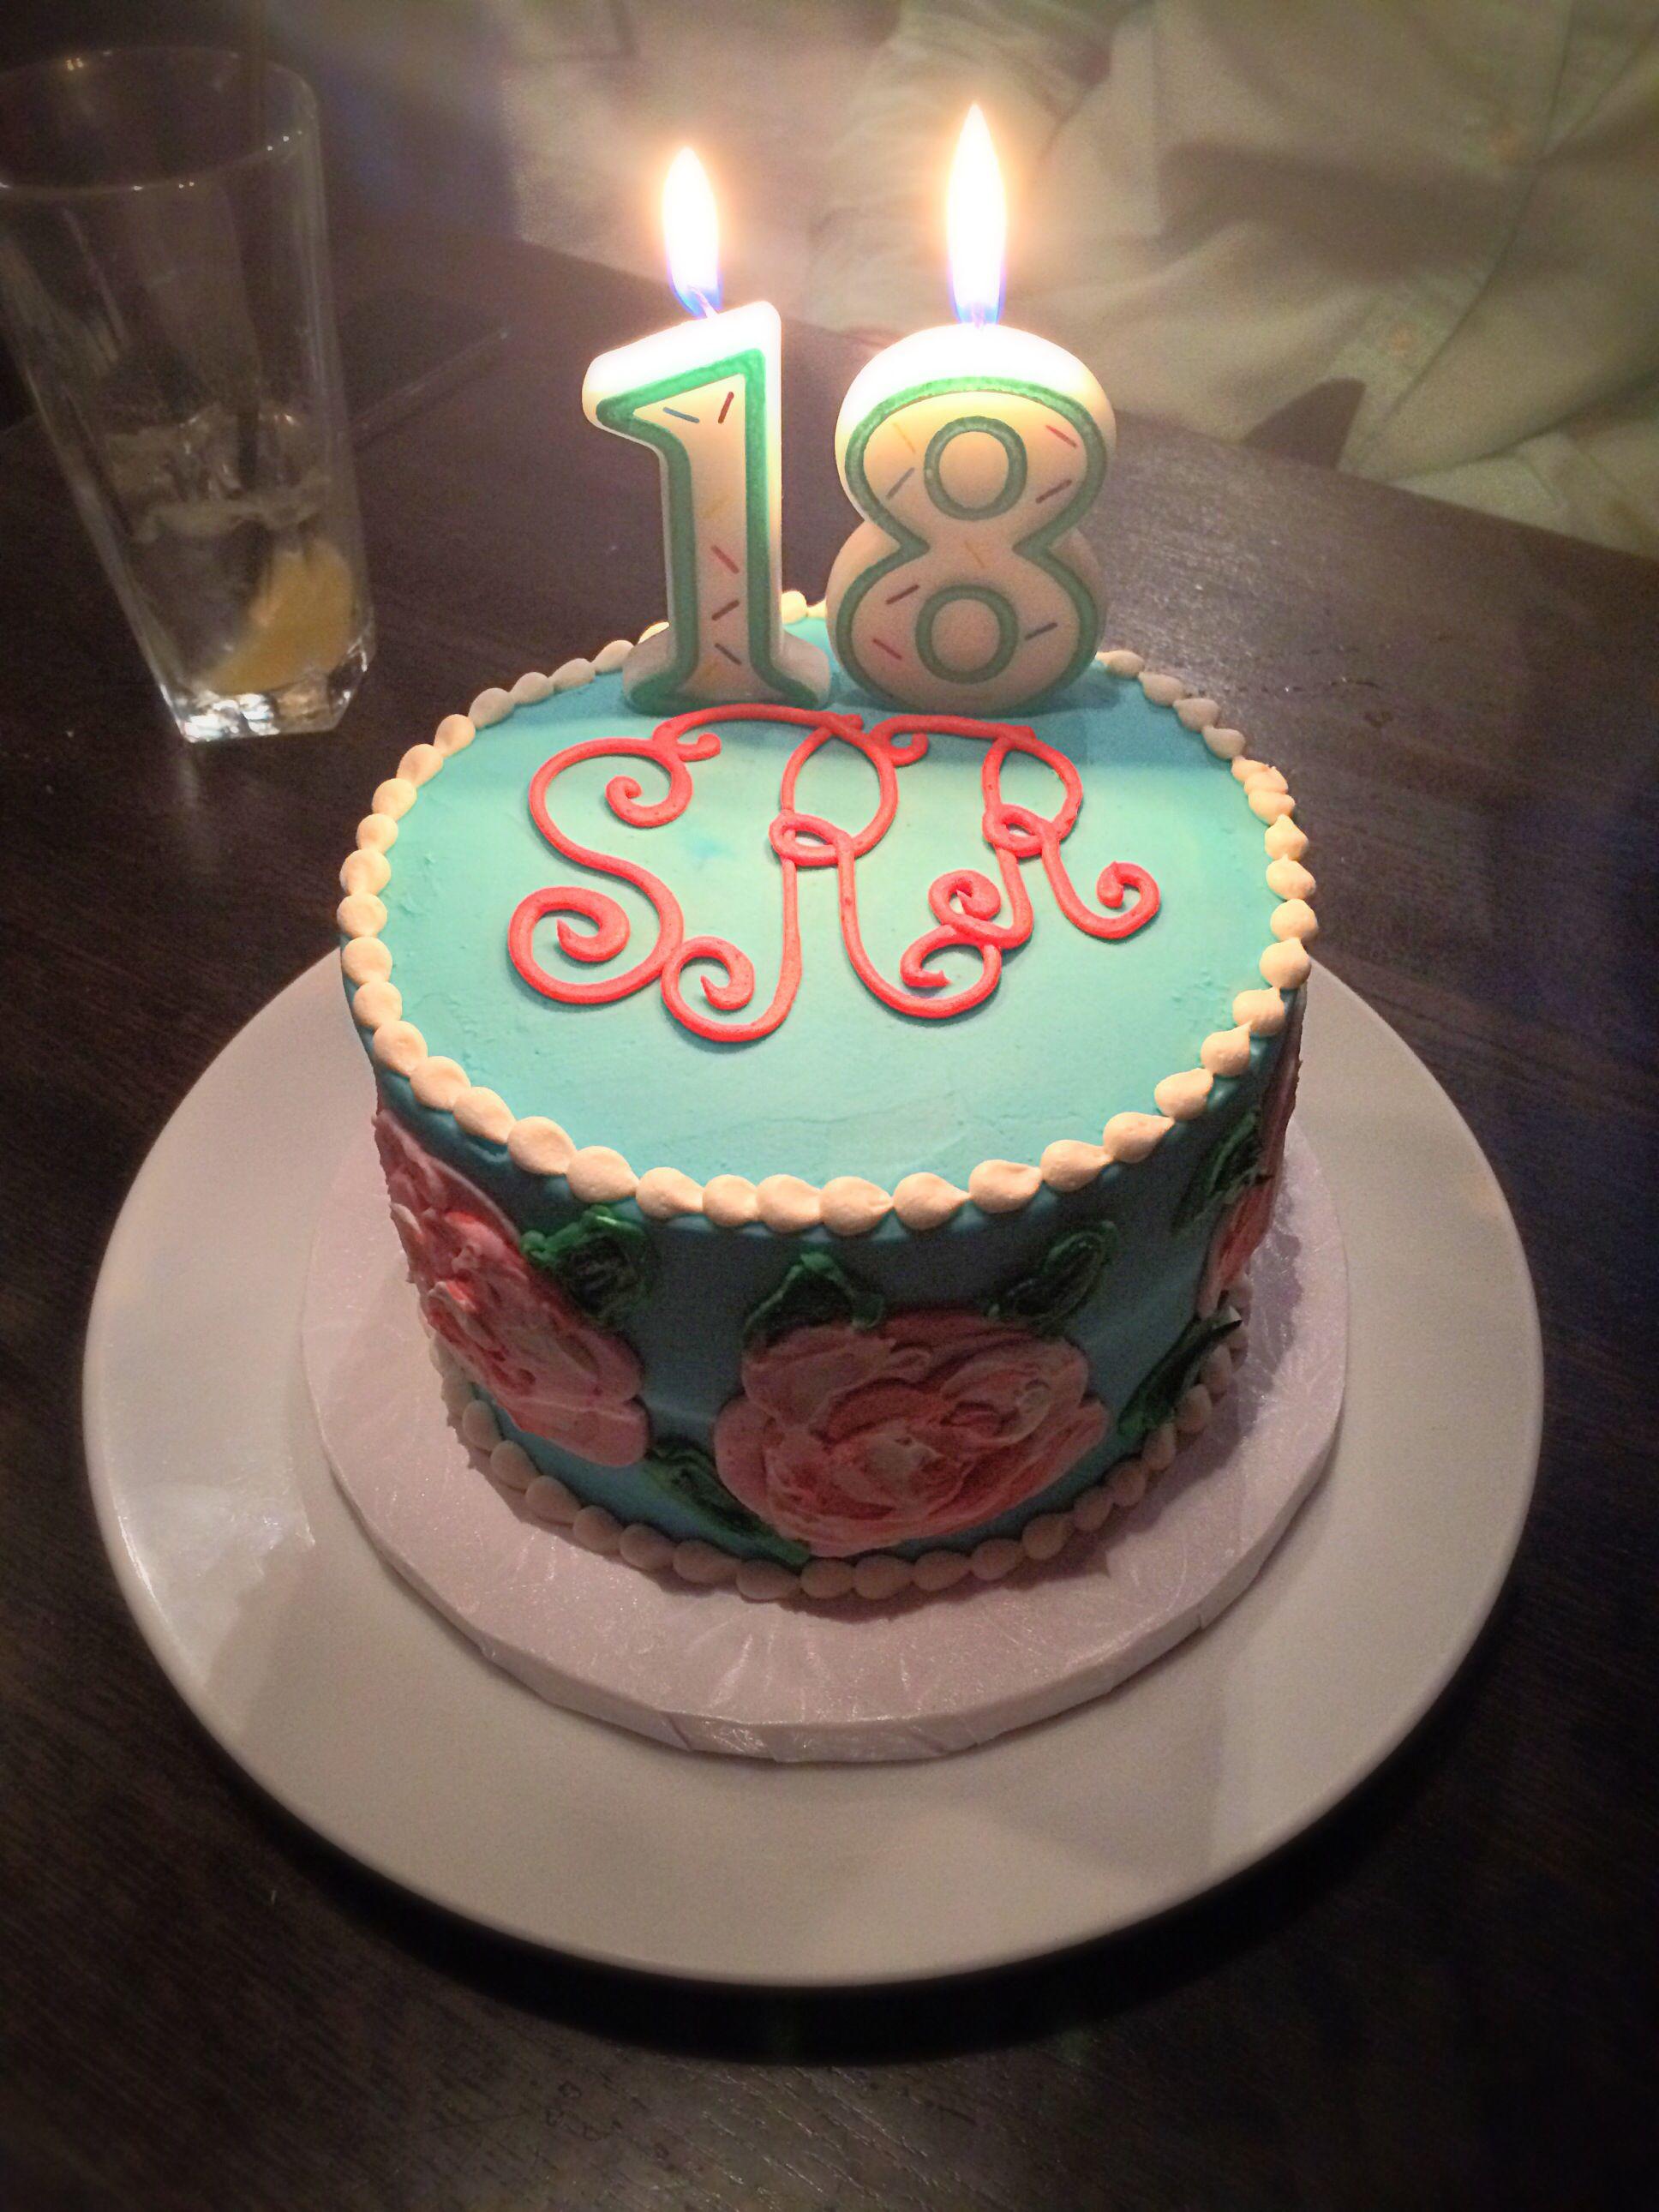 Tremendous Monogrammed Lilly Pulitzer Birthday Cake Twin Birthday Cakes Funny Birthday Cards Online Alyptdamsfinfo